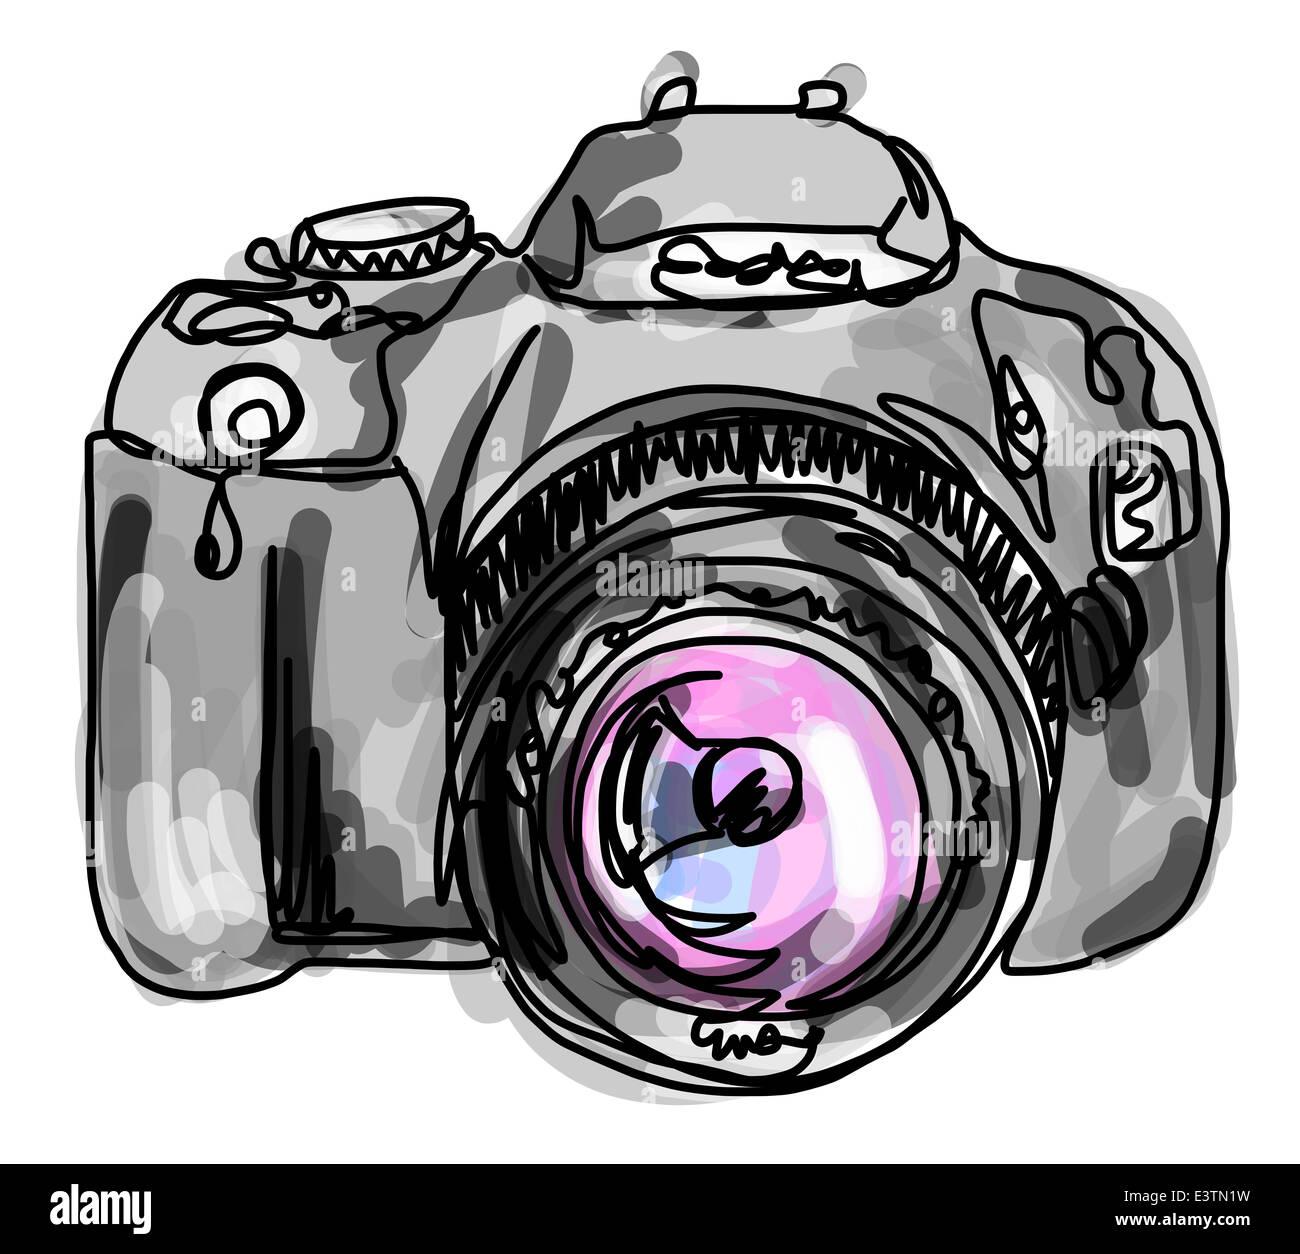 Dibujo De Línea Continua De Una Cámara Fotografía De Stock Alamy